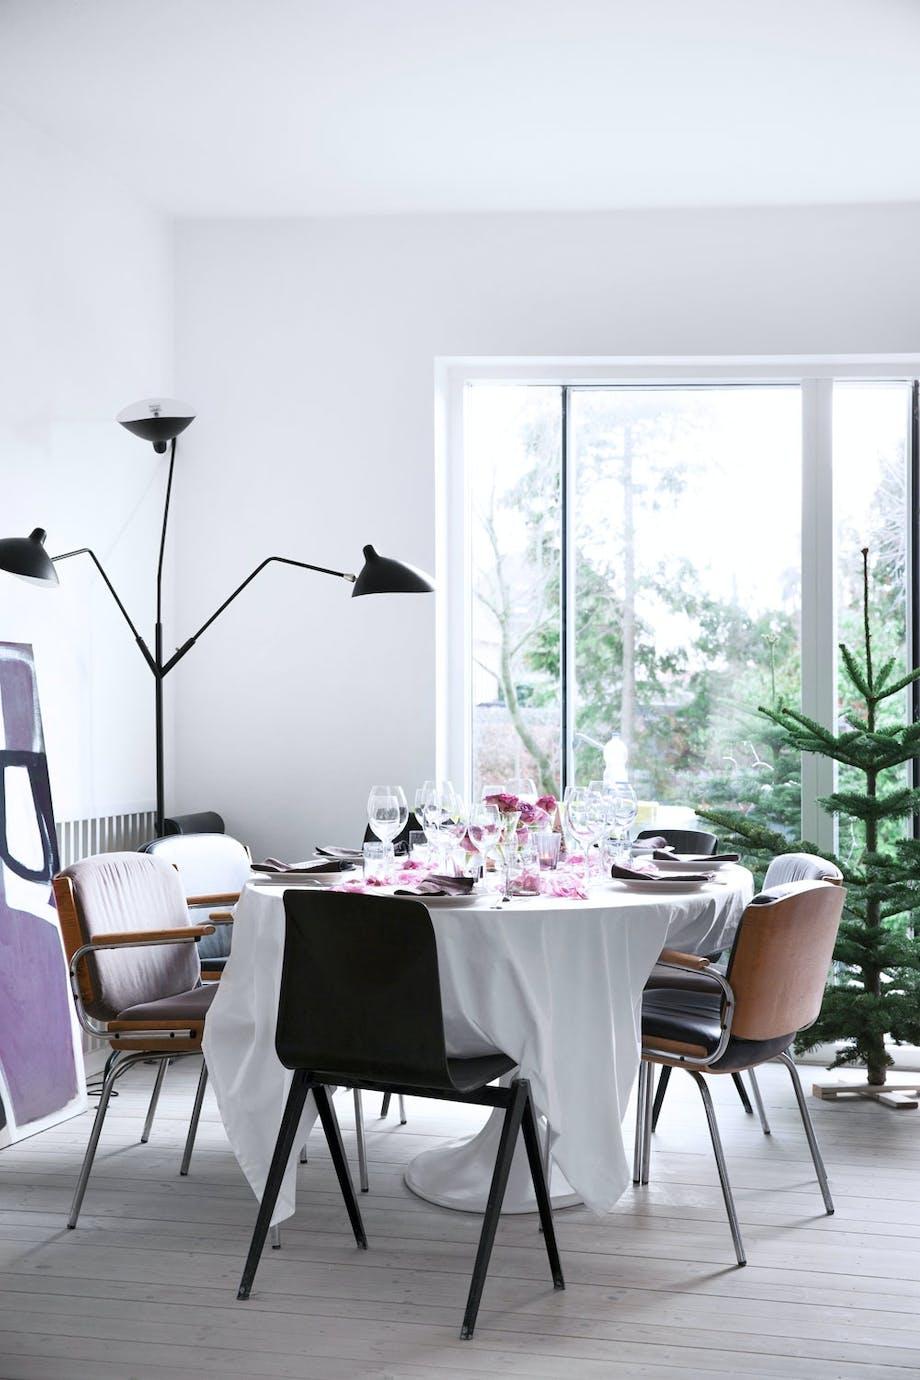 Spisebord fra Eero Saarinen og bart juletre